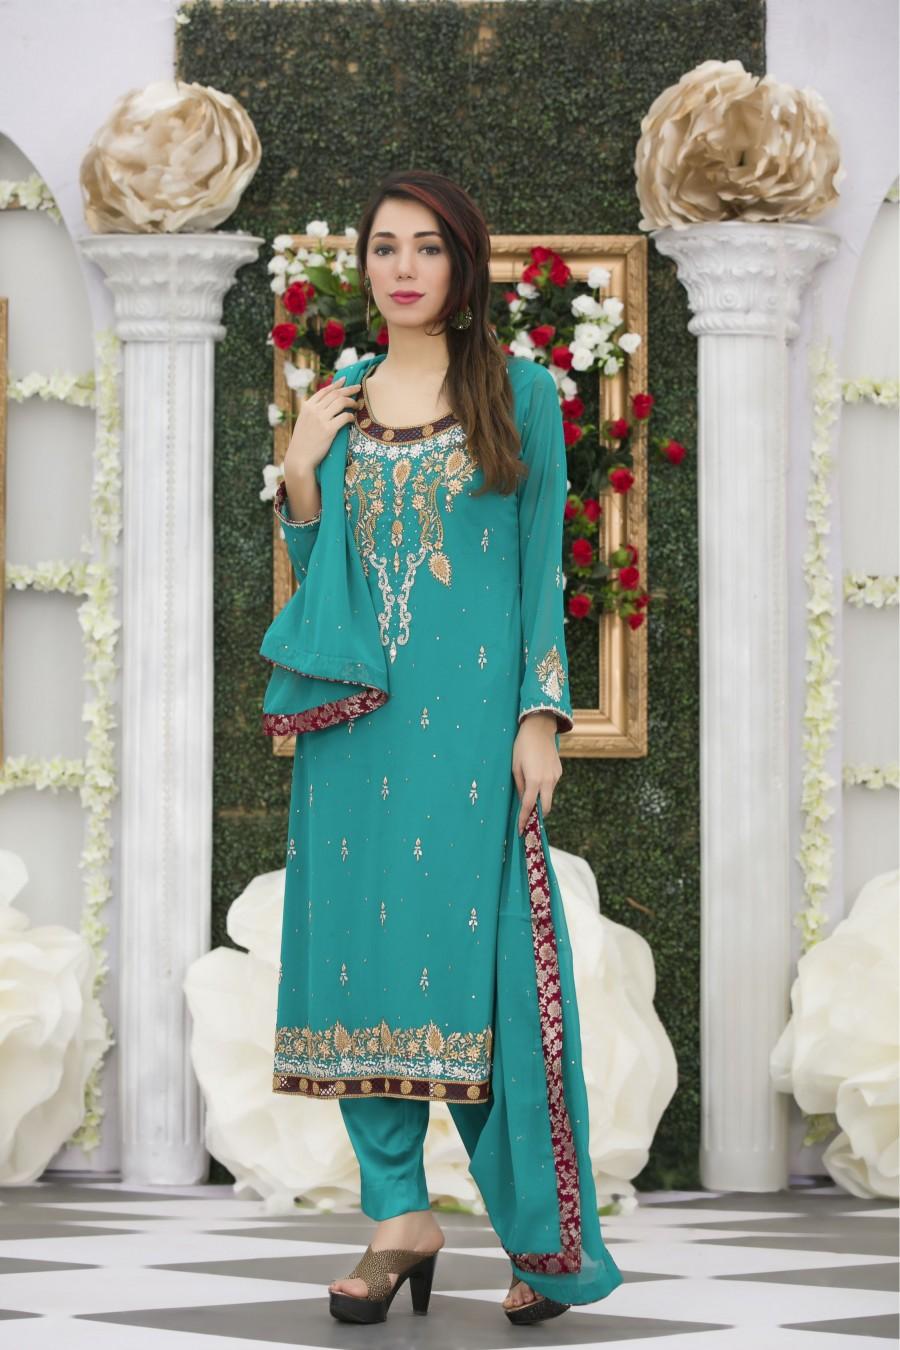 C Colored Dresses Photo Dress Wallpaper Hd A